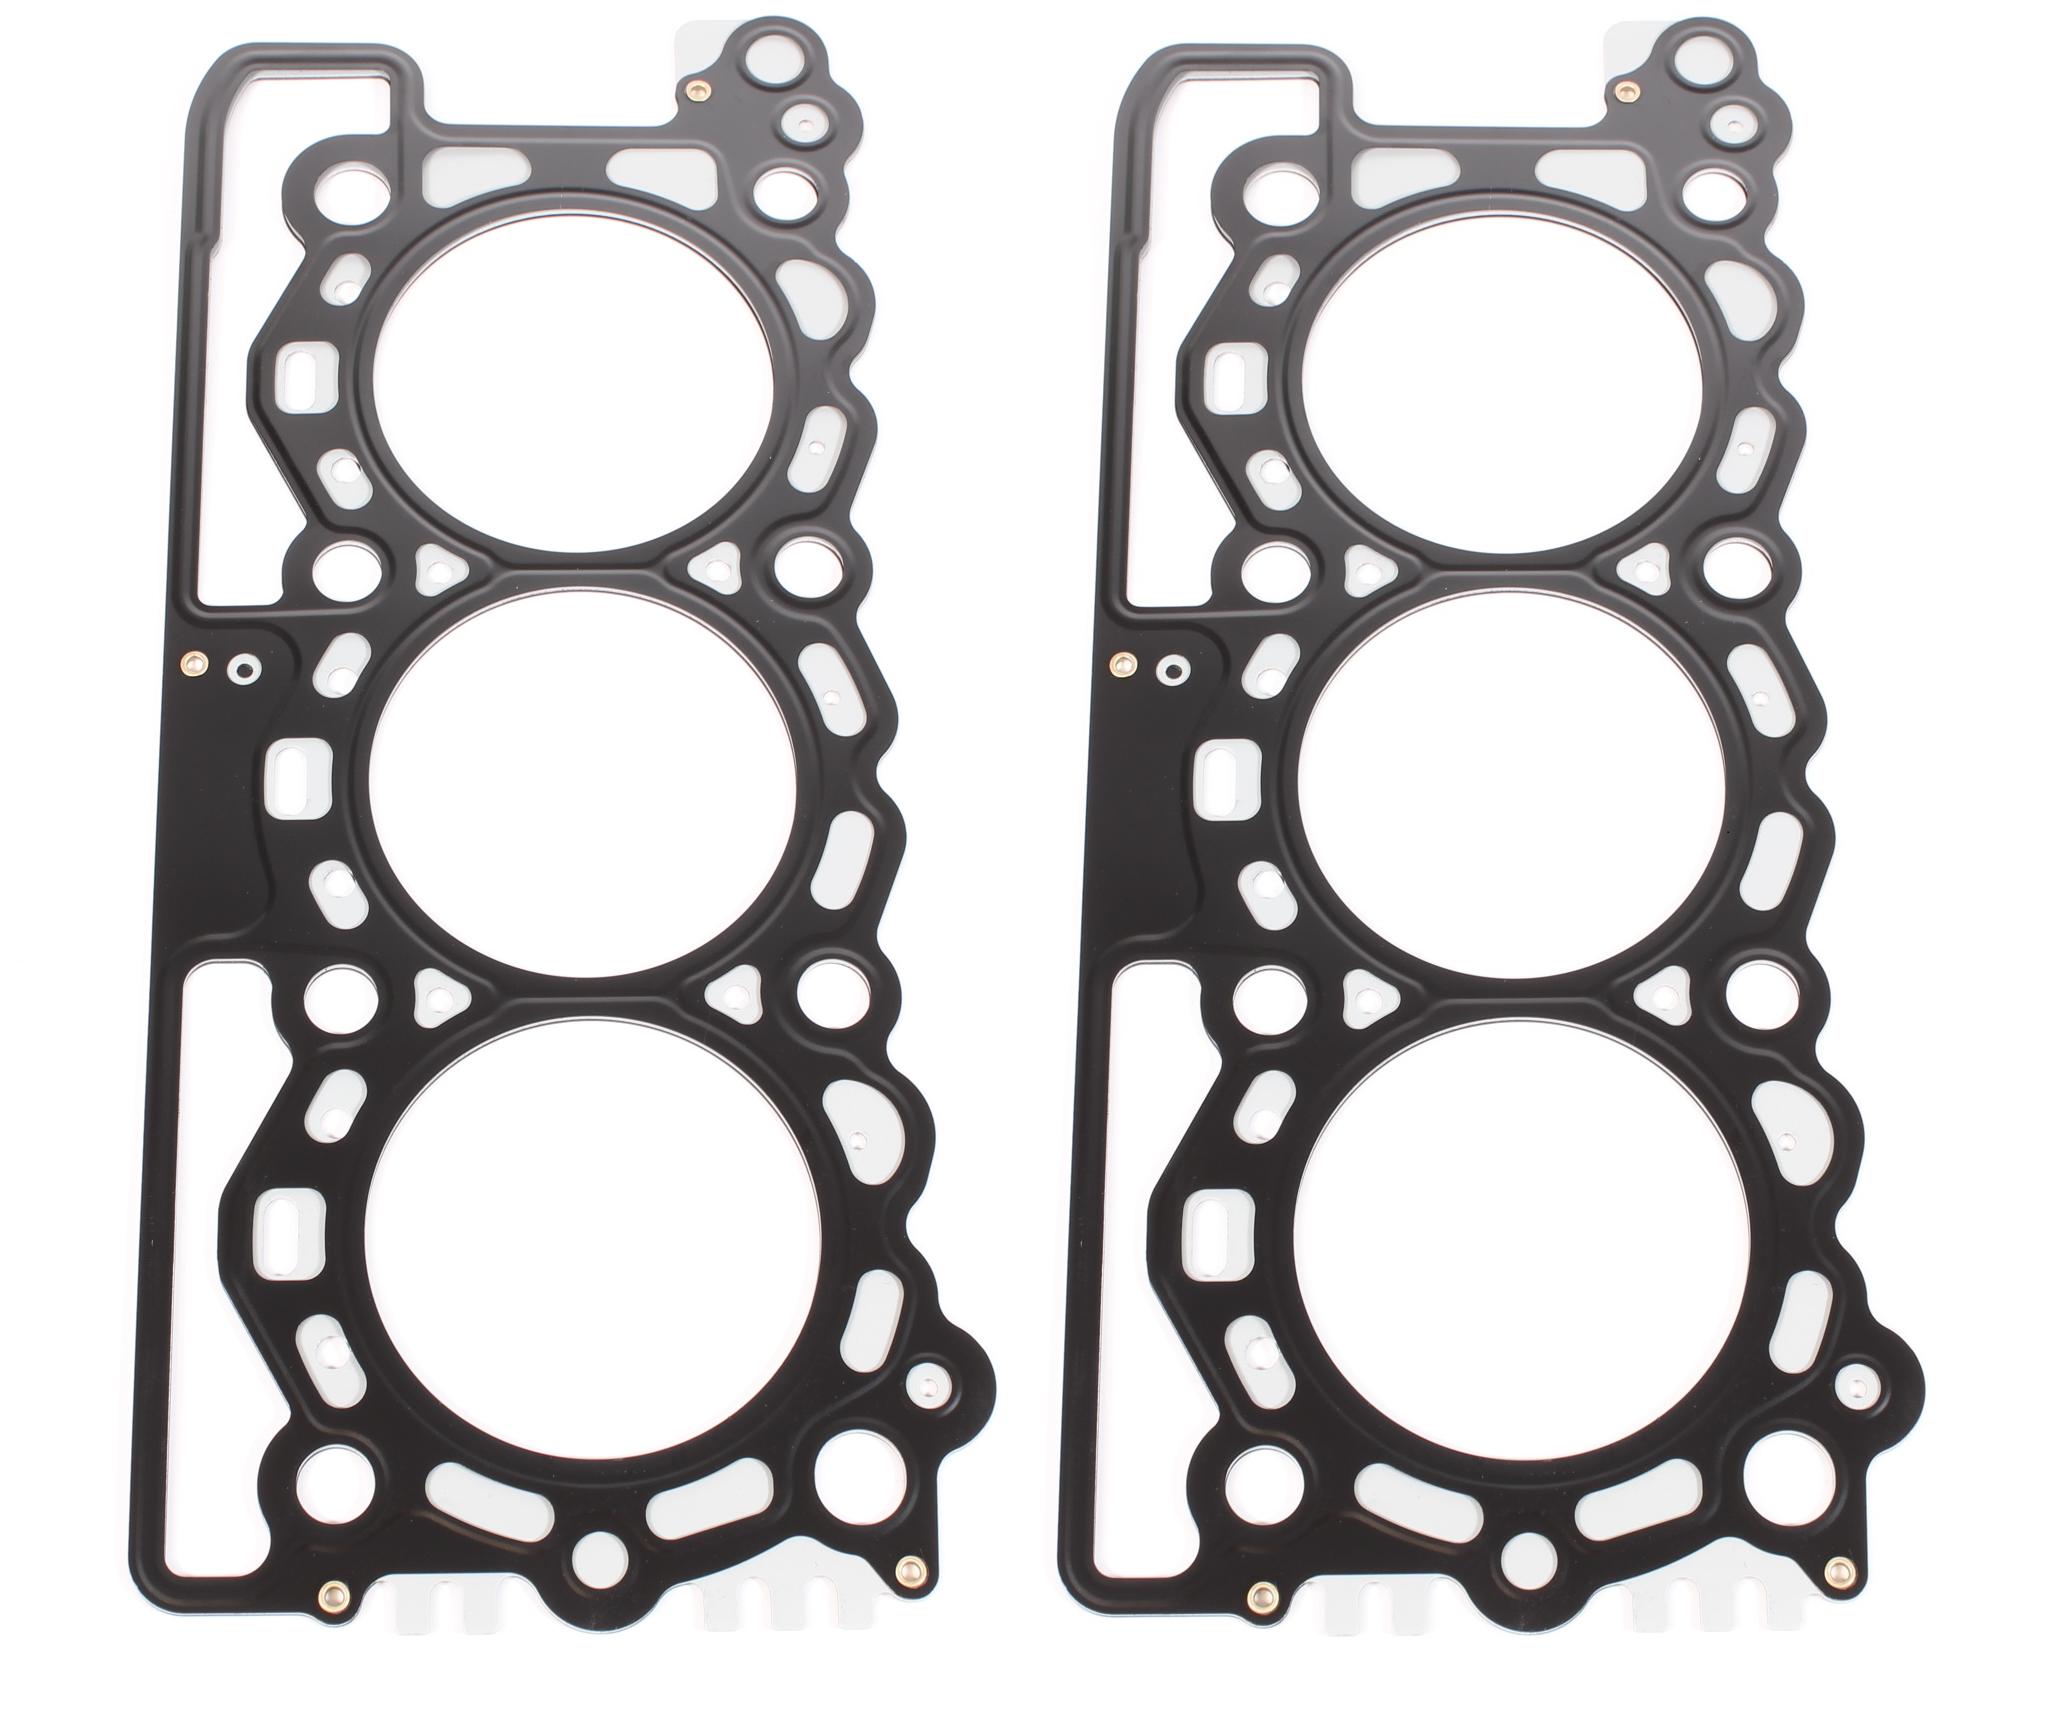 2x Zylinderkopfdichtung ZKD Citroen C5 3,0 HDi V6 240 DT20C 0209.HA NEU